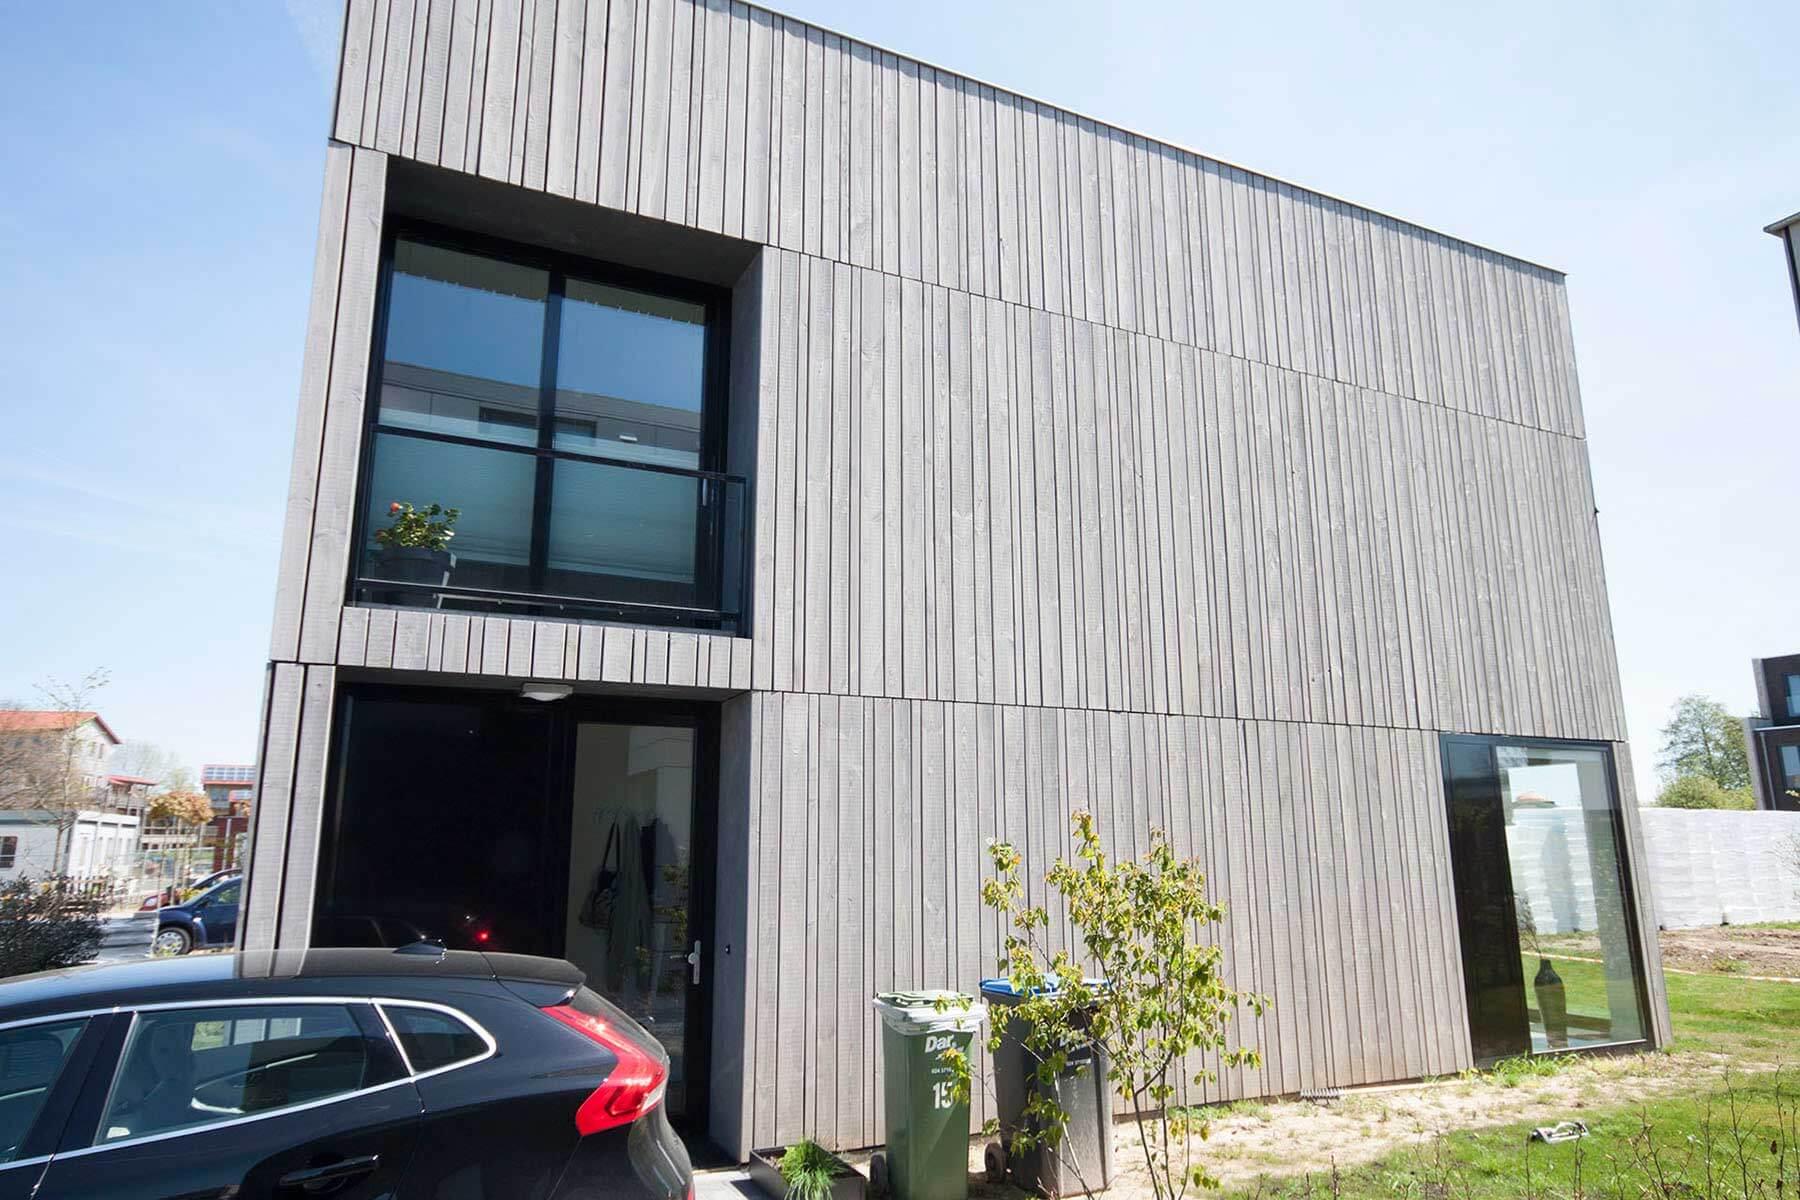 8A-Architecten-datcha-house-2-Lent-03